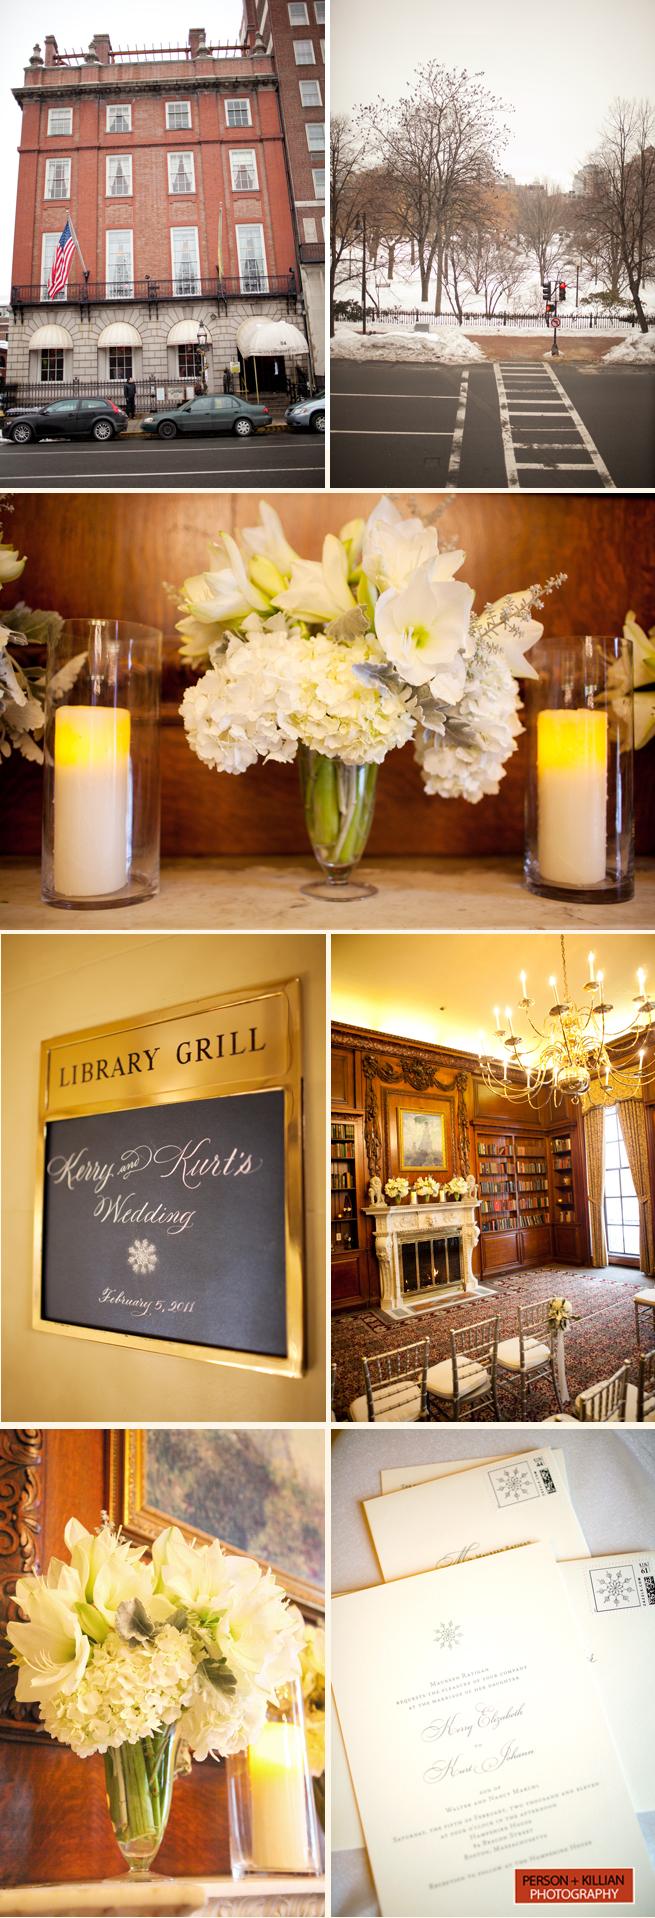 the hampshire house boston archives boston wedding photographer